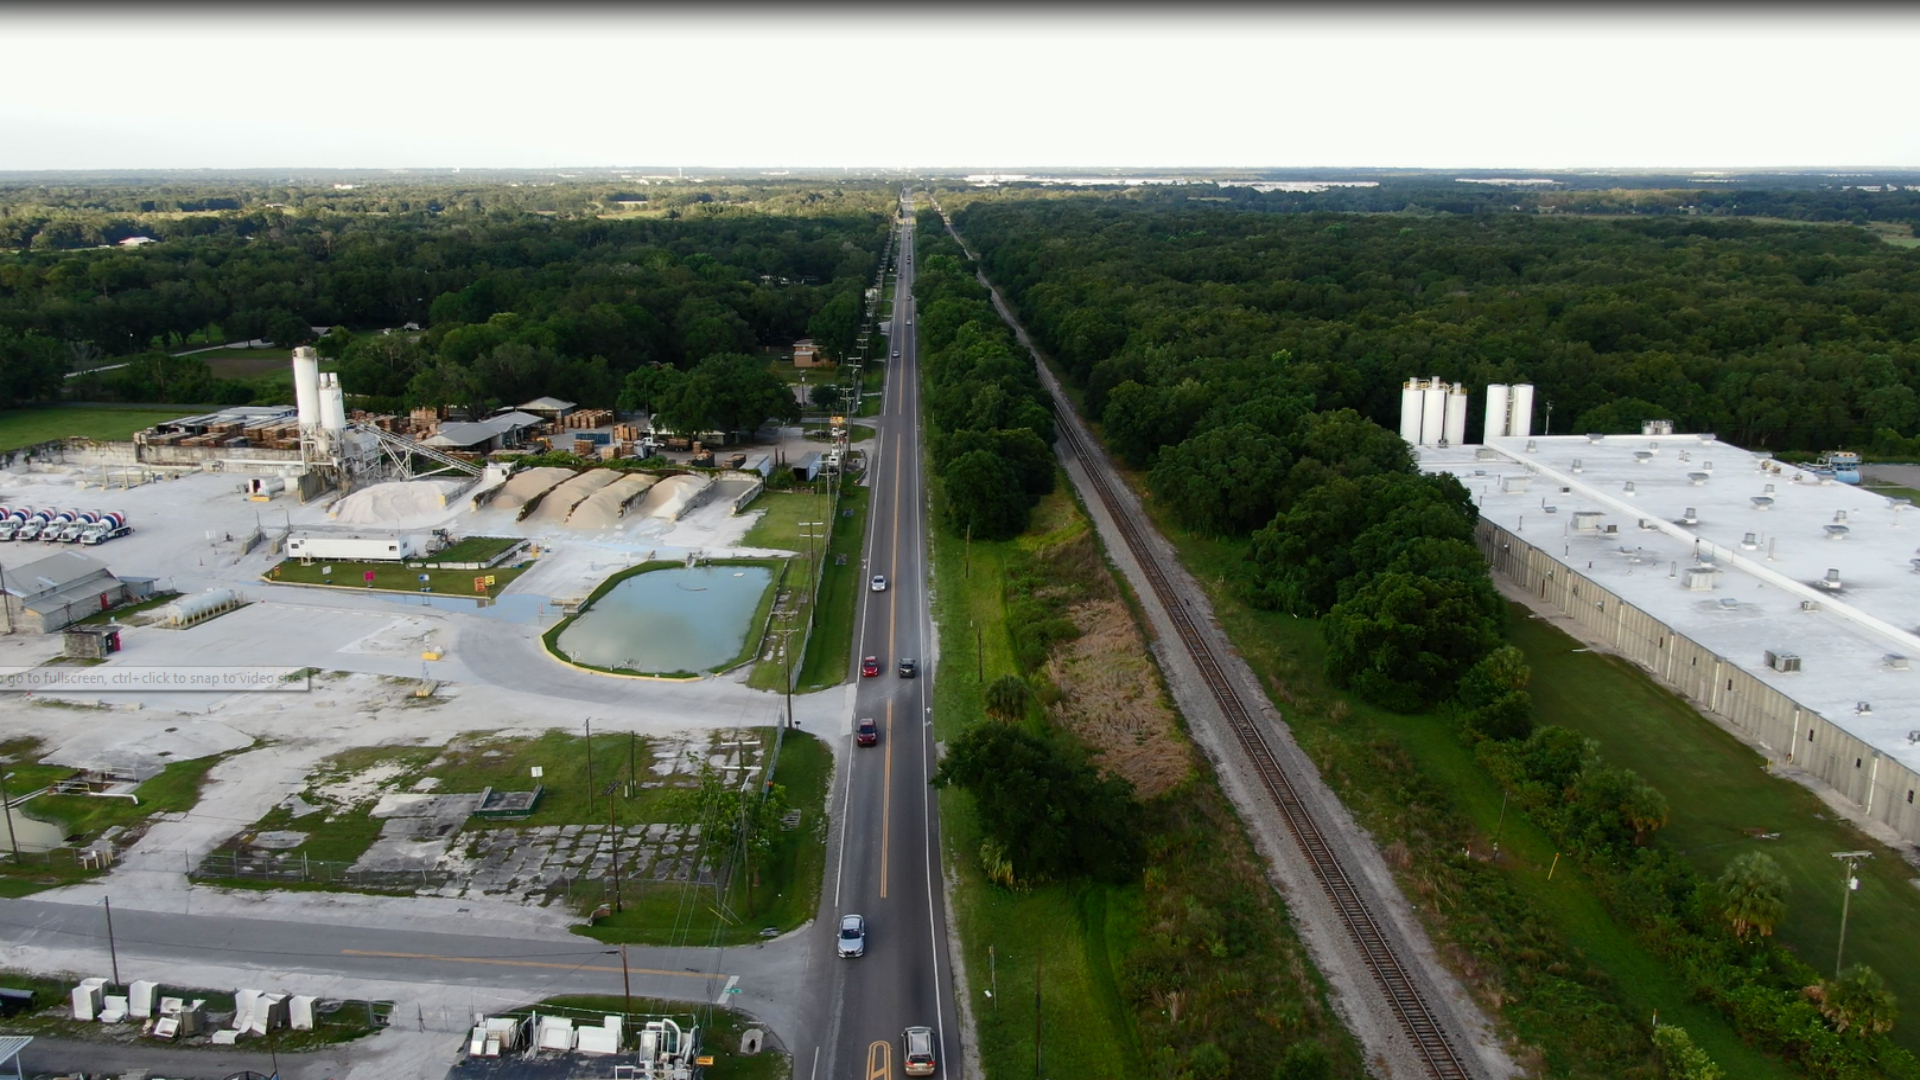 US-92 Hillsborough County